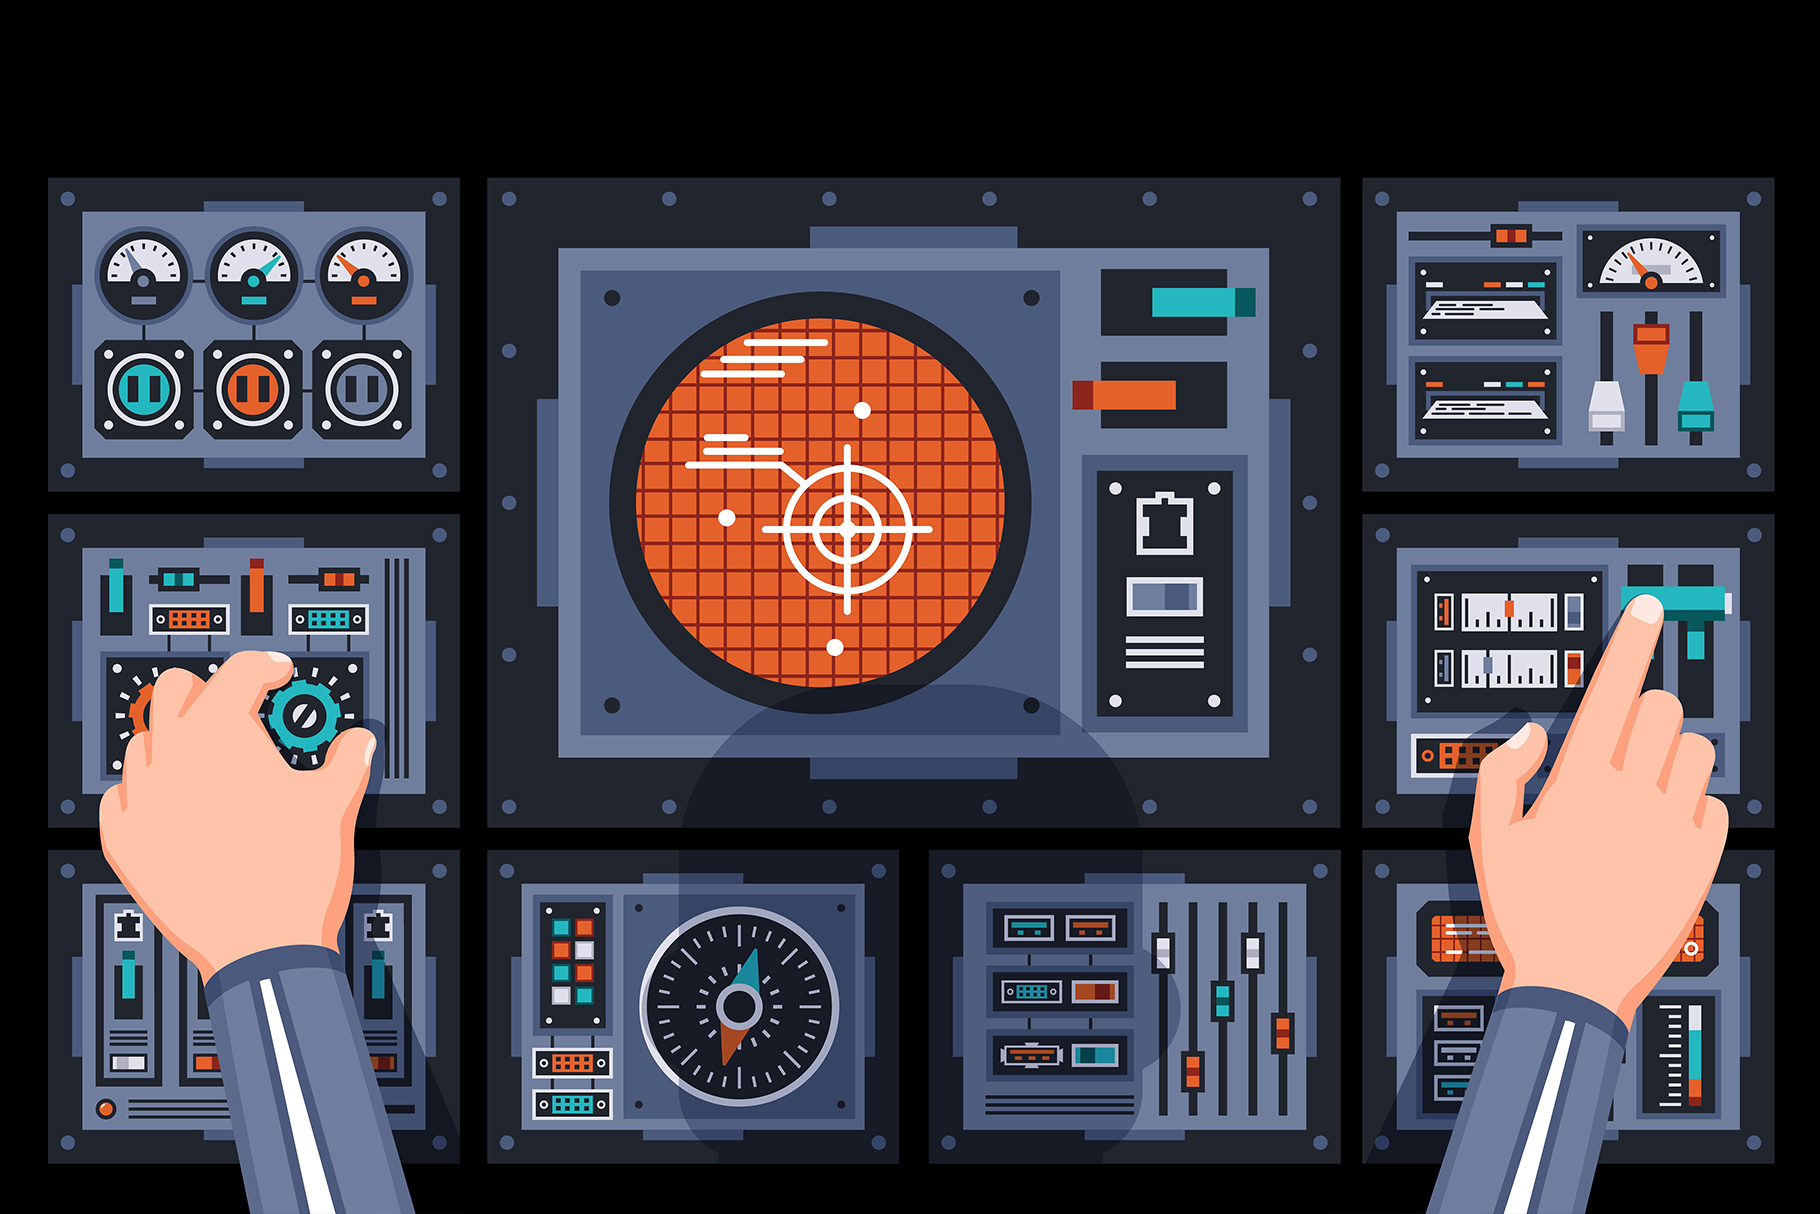 Control Panels Spaceship example image 6